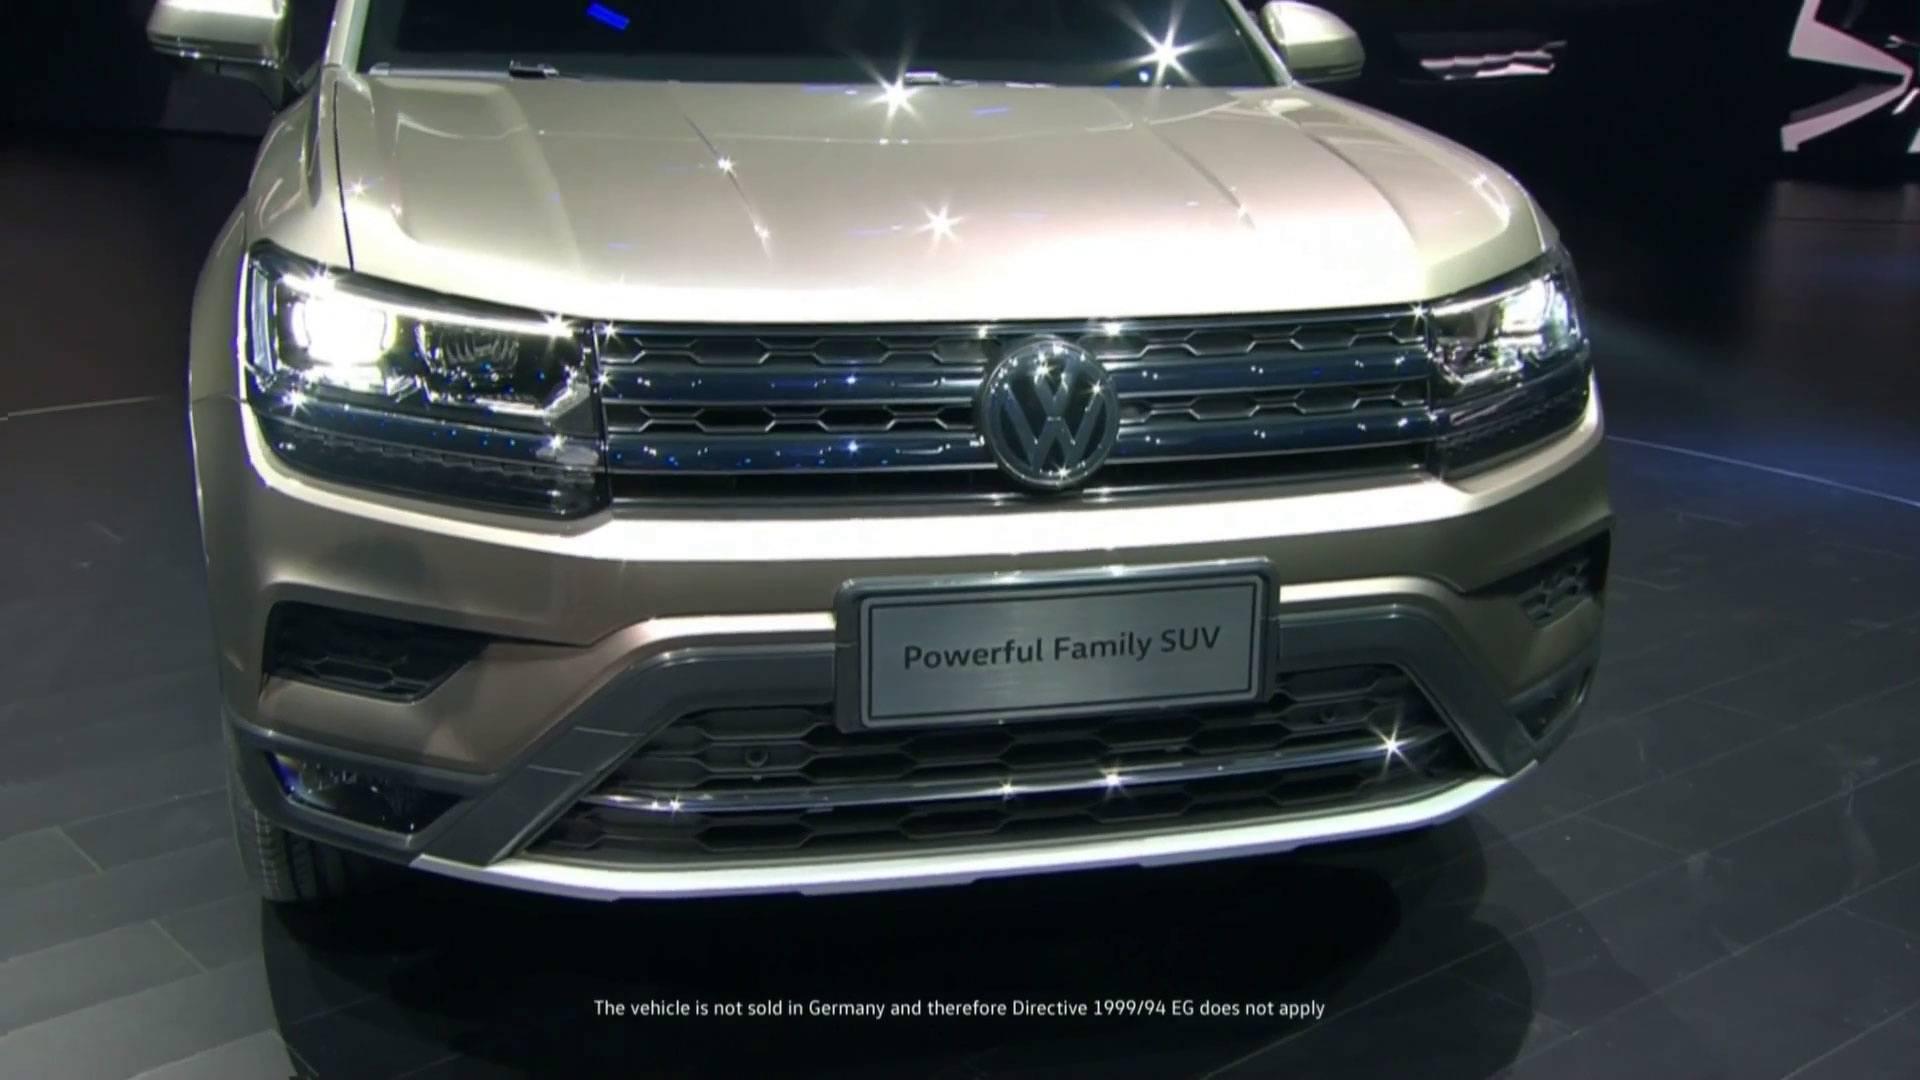 FormaCar: Volkswagen ID.Buzz test mule spotted running around